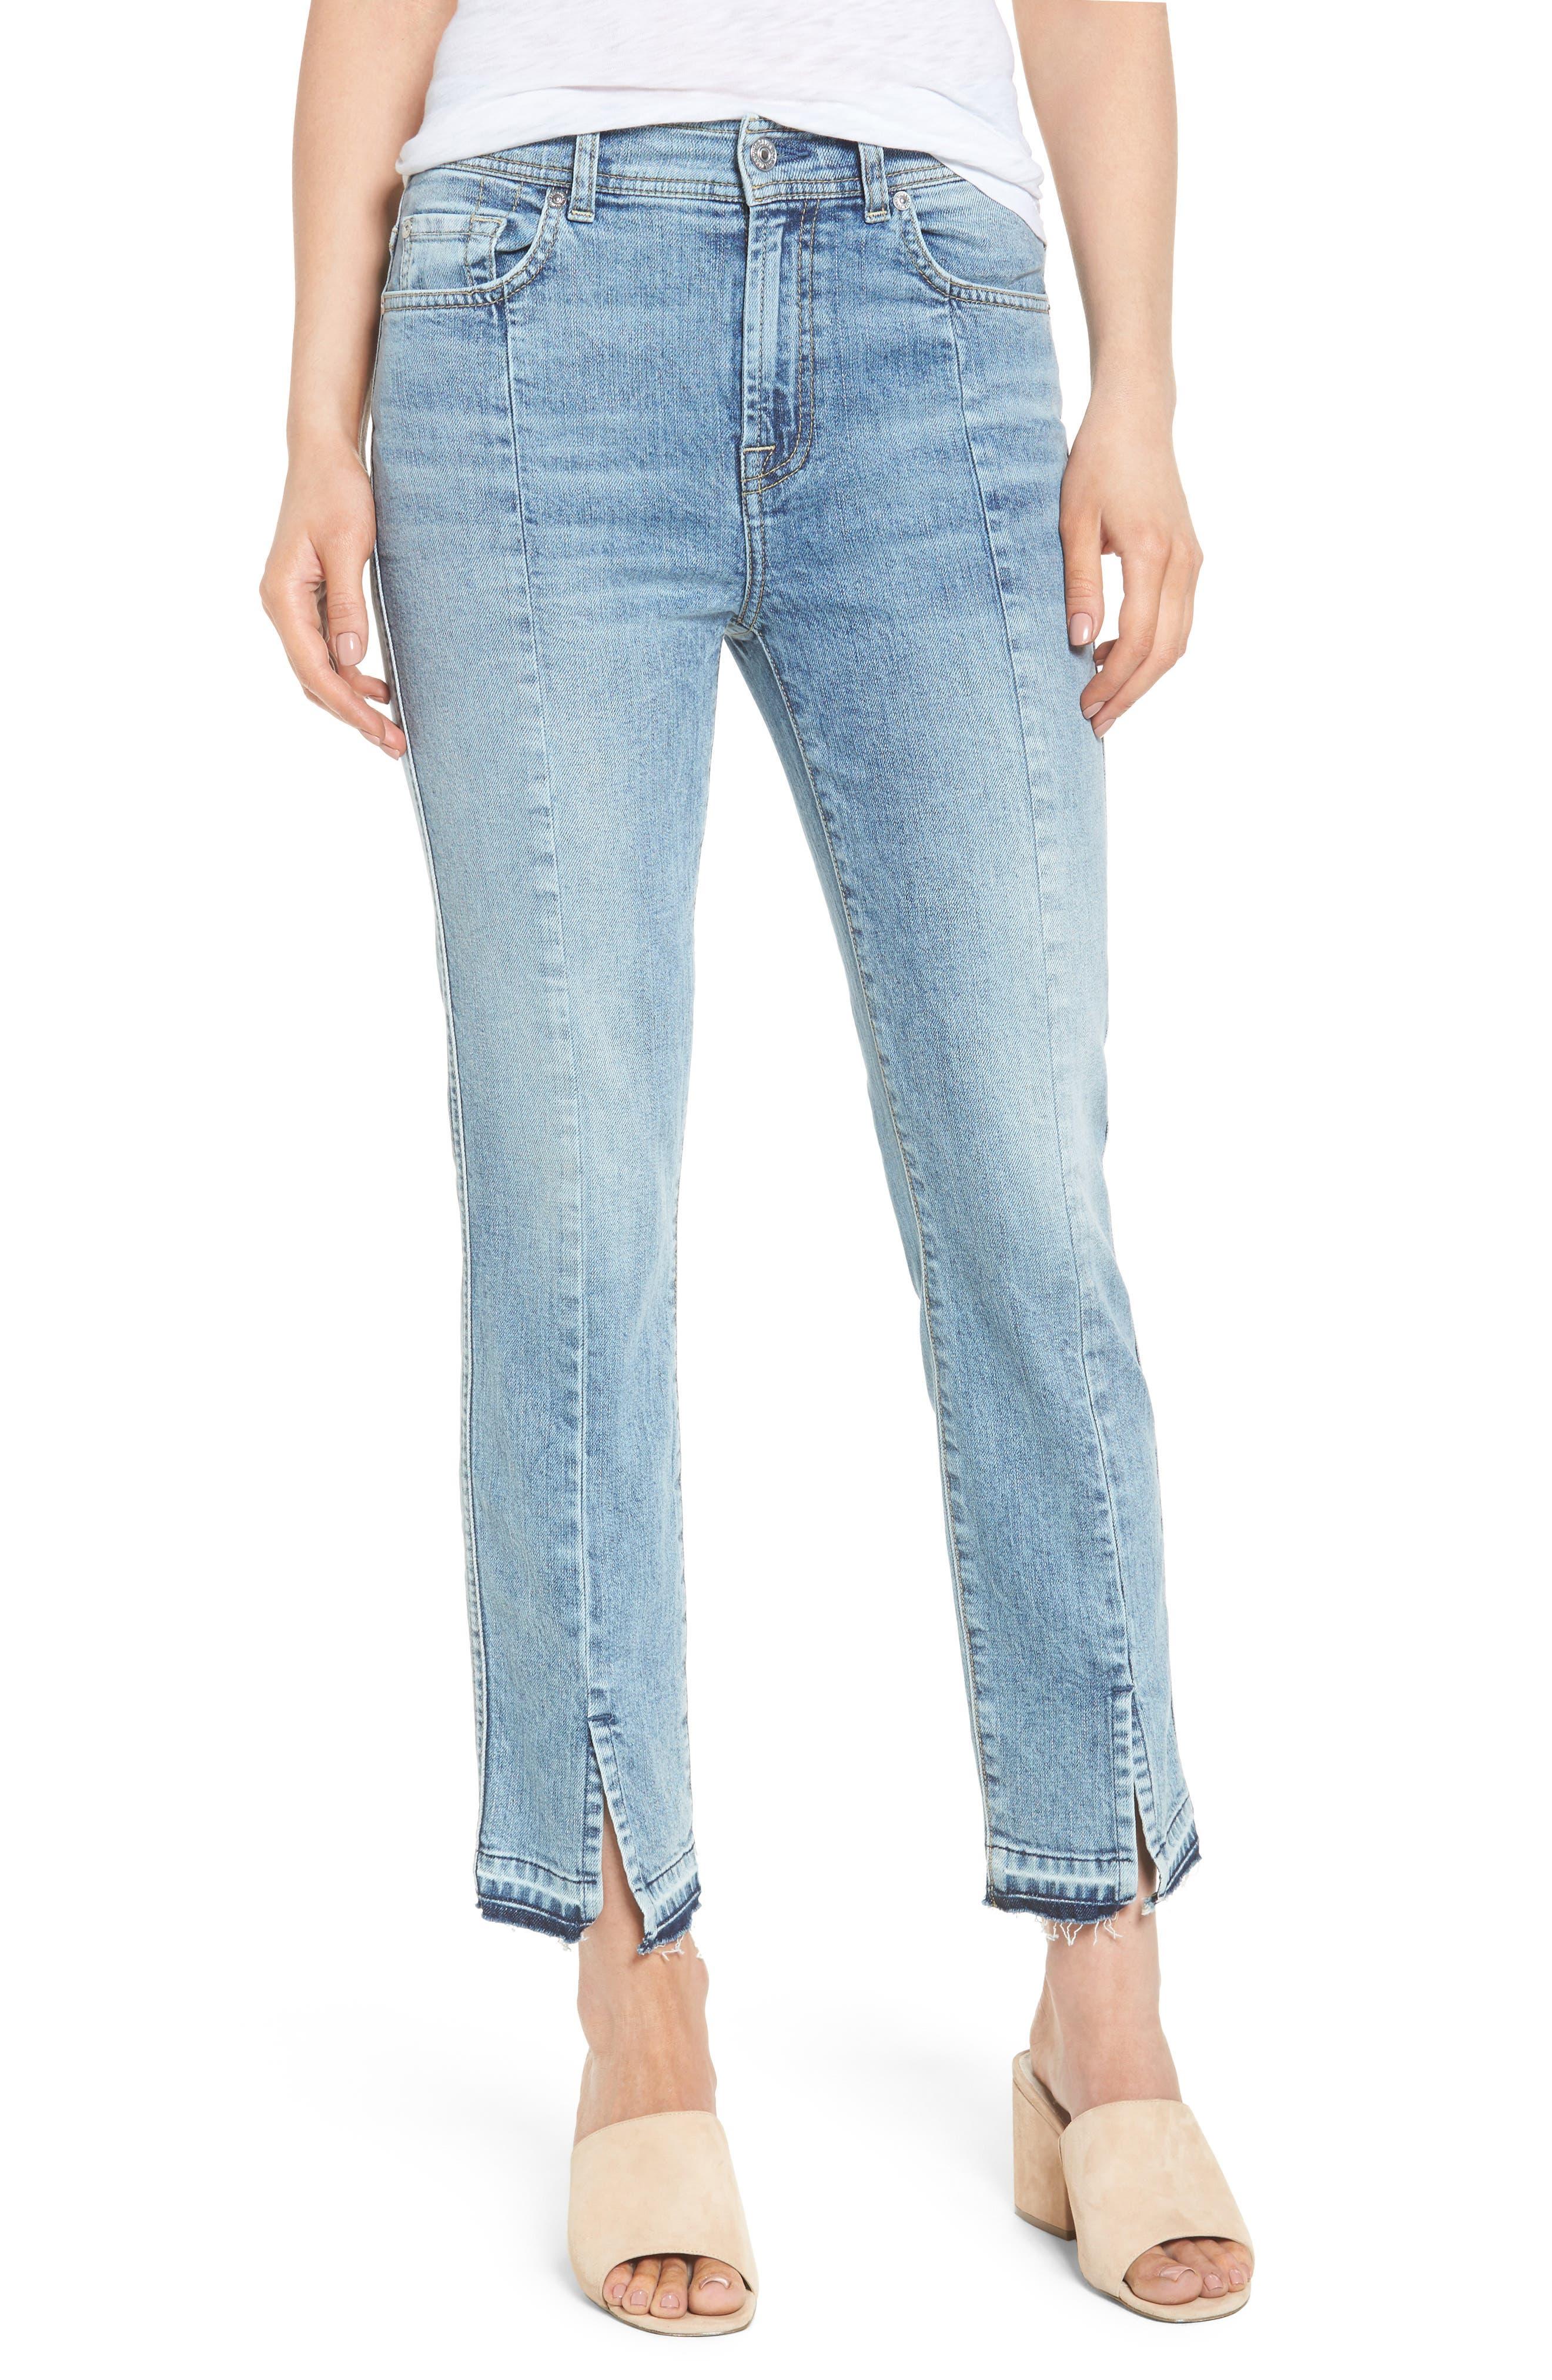 Alternate Image 1 Selected - 7 For All Mankind® Release Hem Ankle Skinny Jeans (Rockaway Beach)